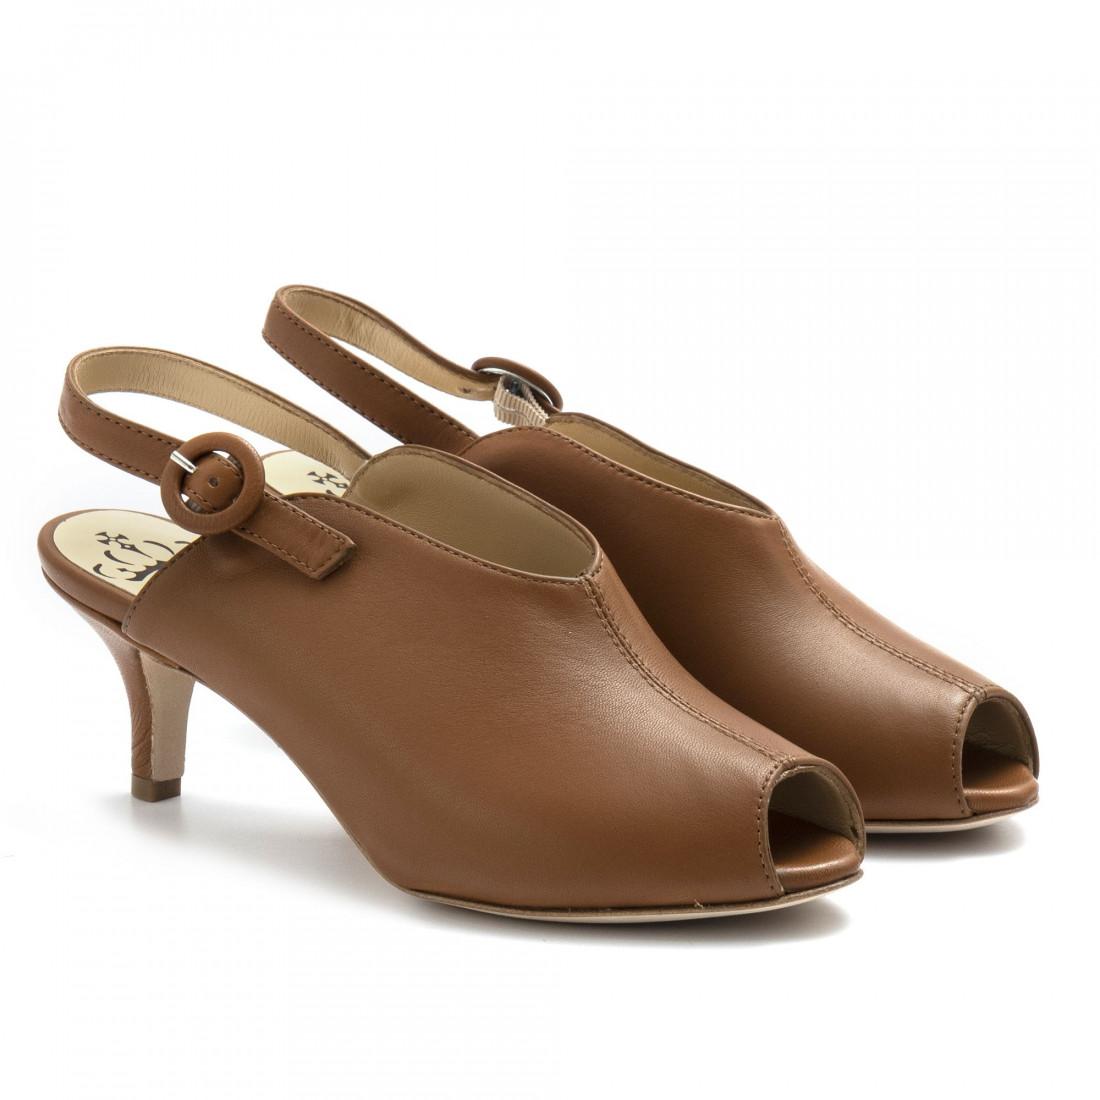 sandals woman larianna sp 8018seta cuoio 4898